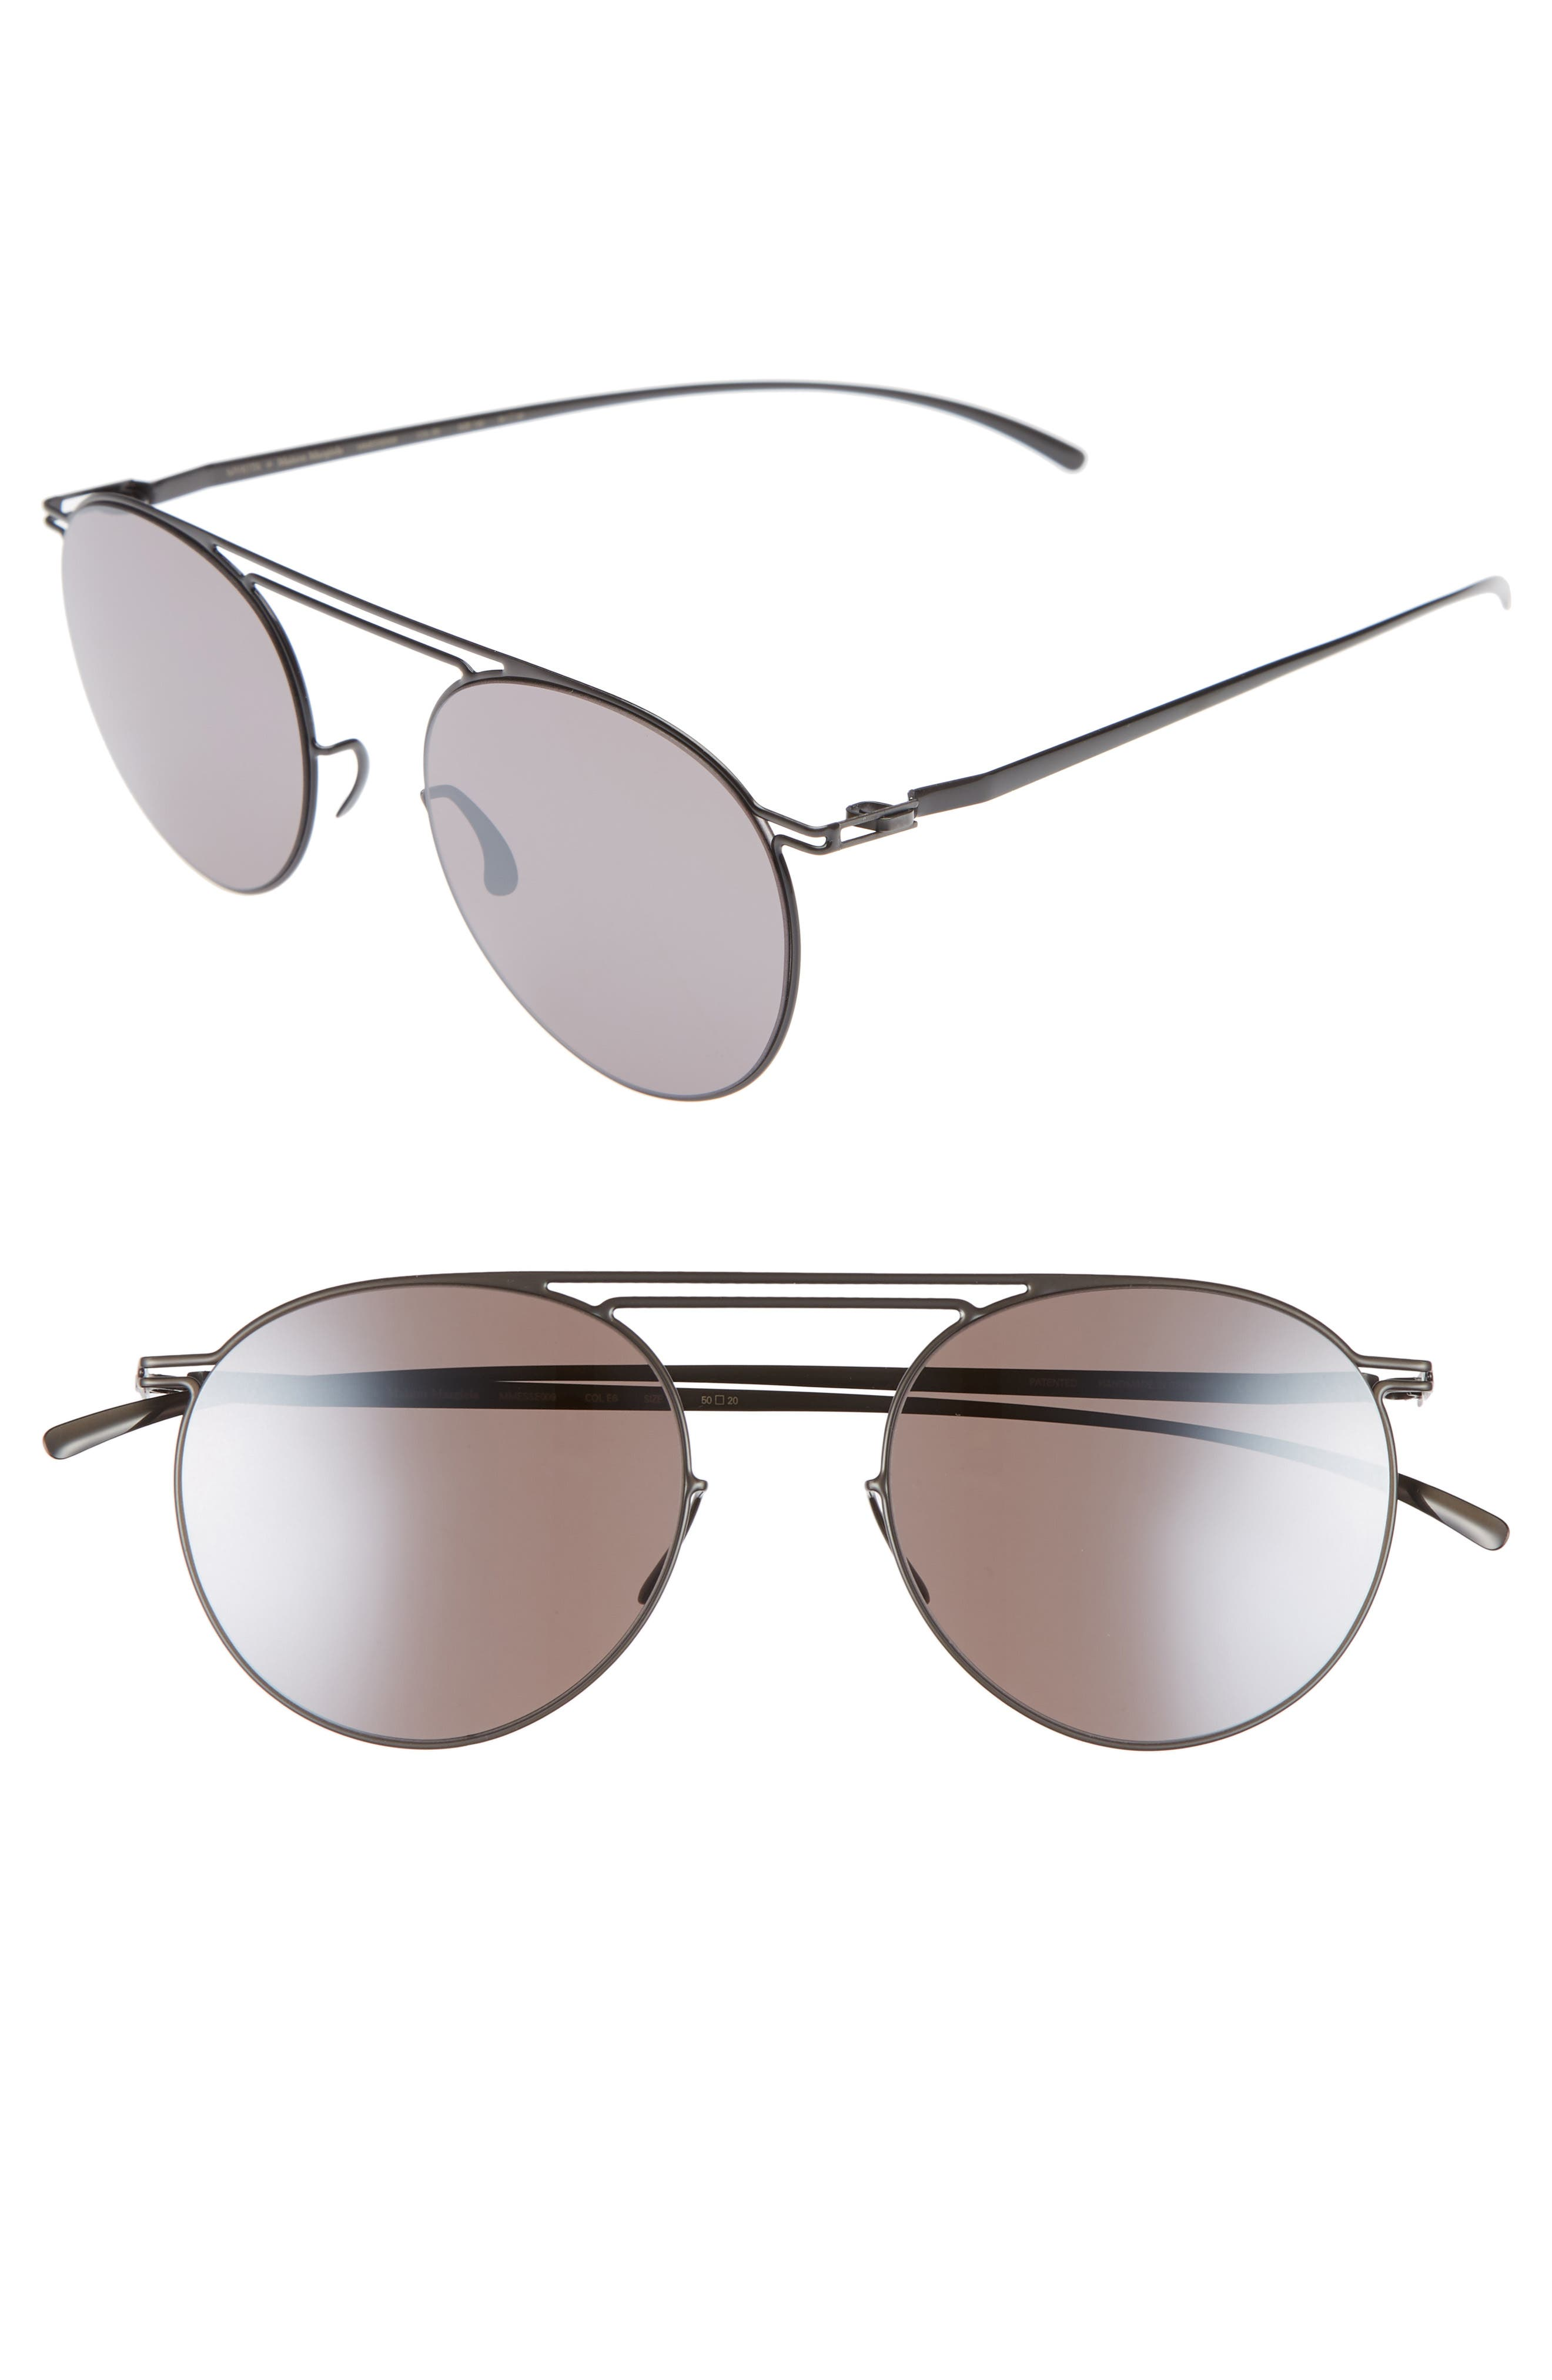 MMESSE009 50mm Sunglasses,                         Main,                         color, Dark Grey